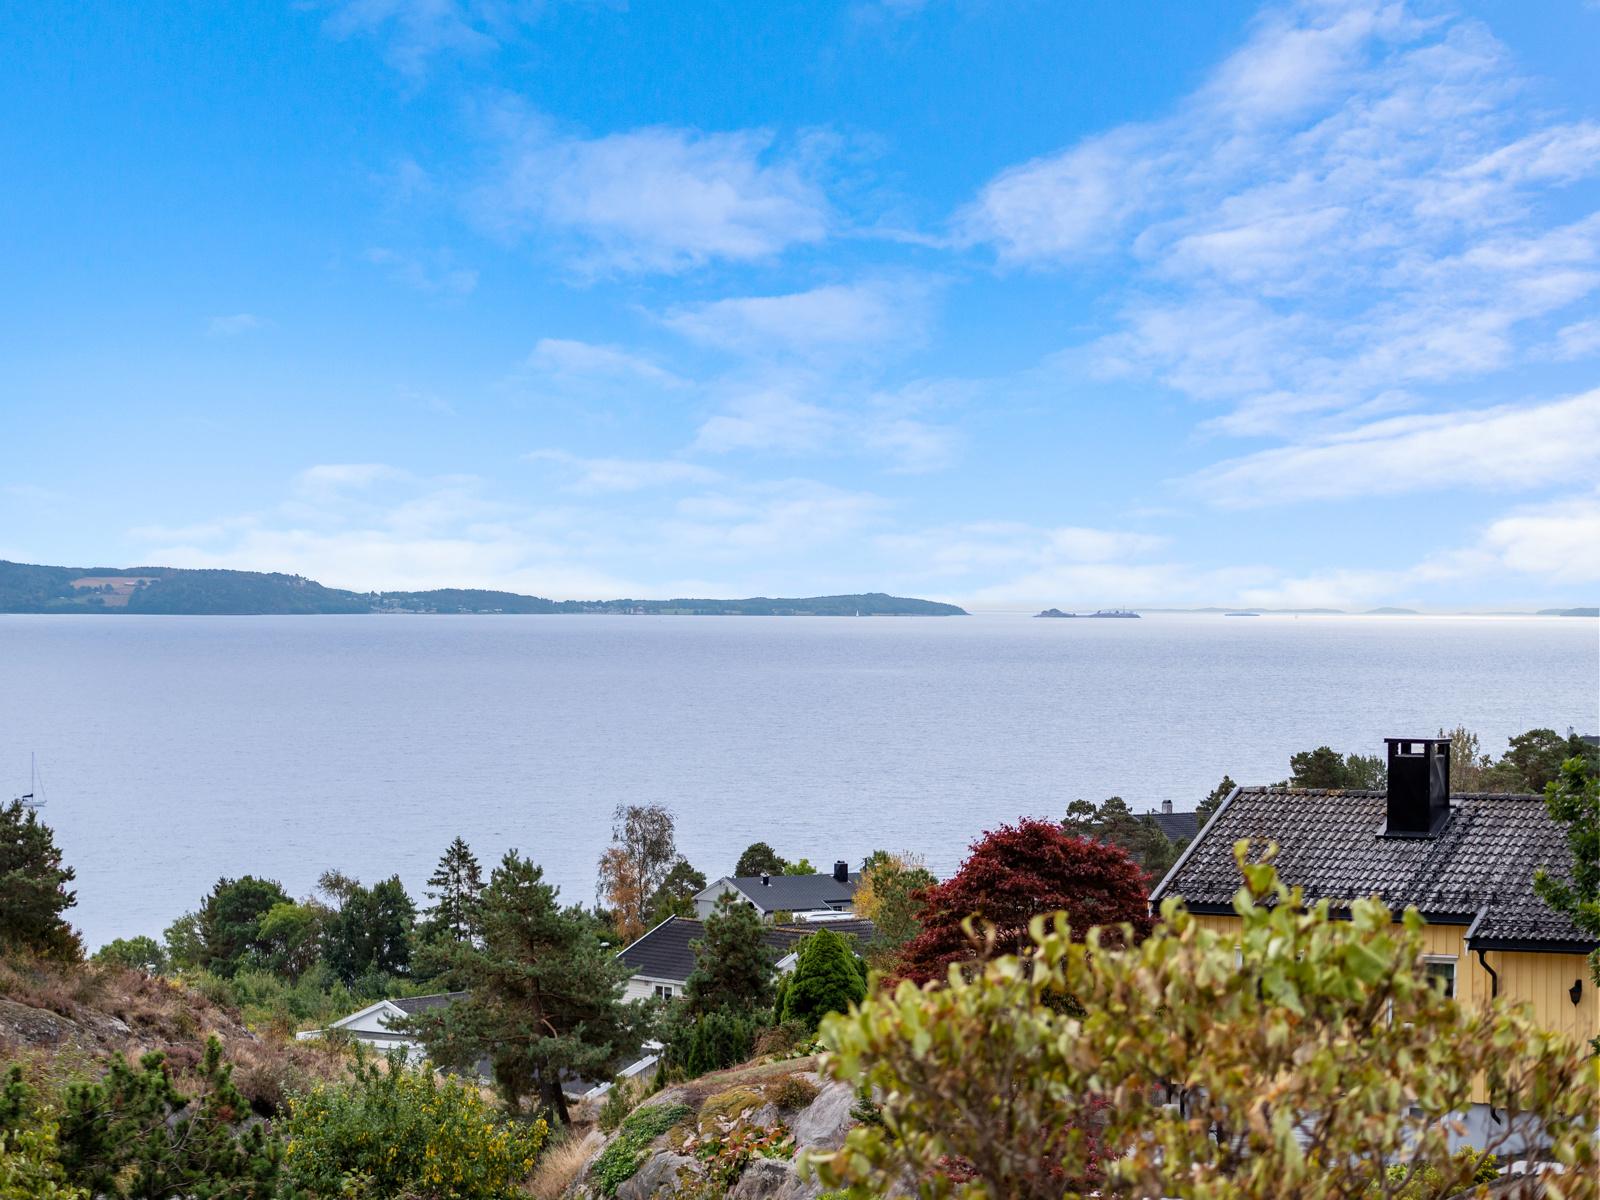 Boligen ligger med flott utsikt utover Oslofjorden